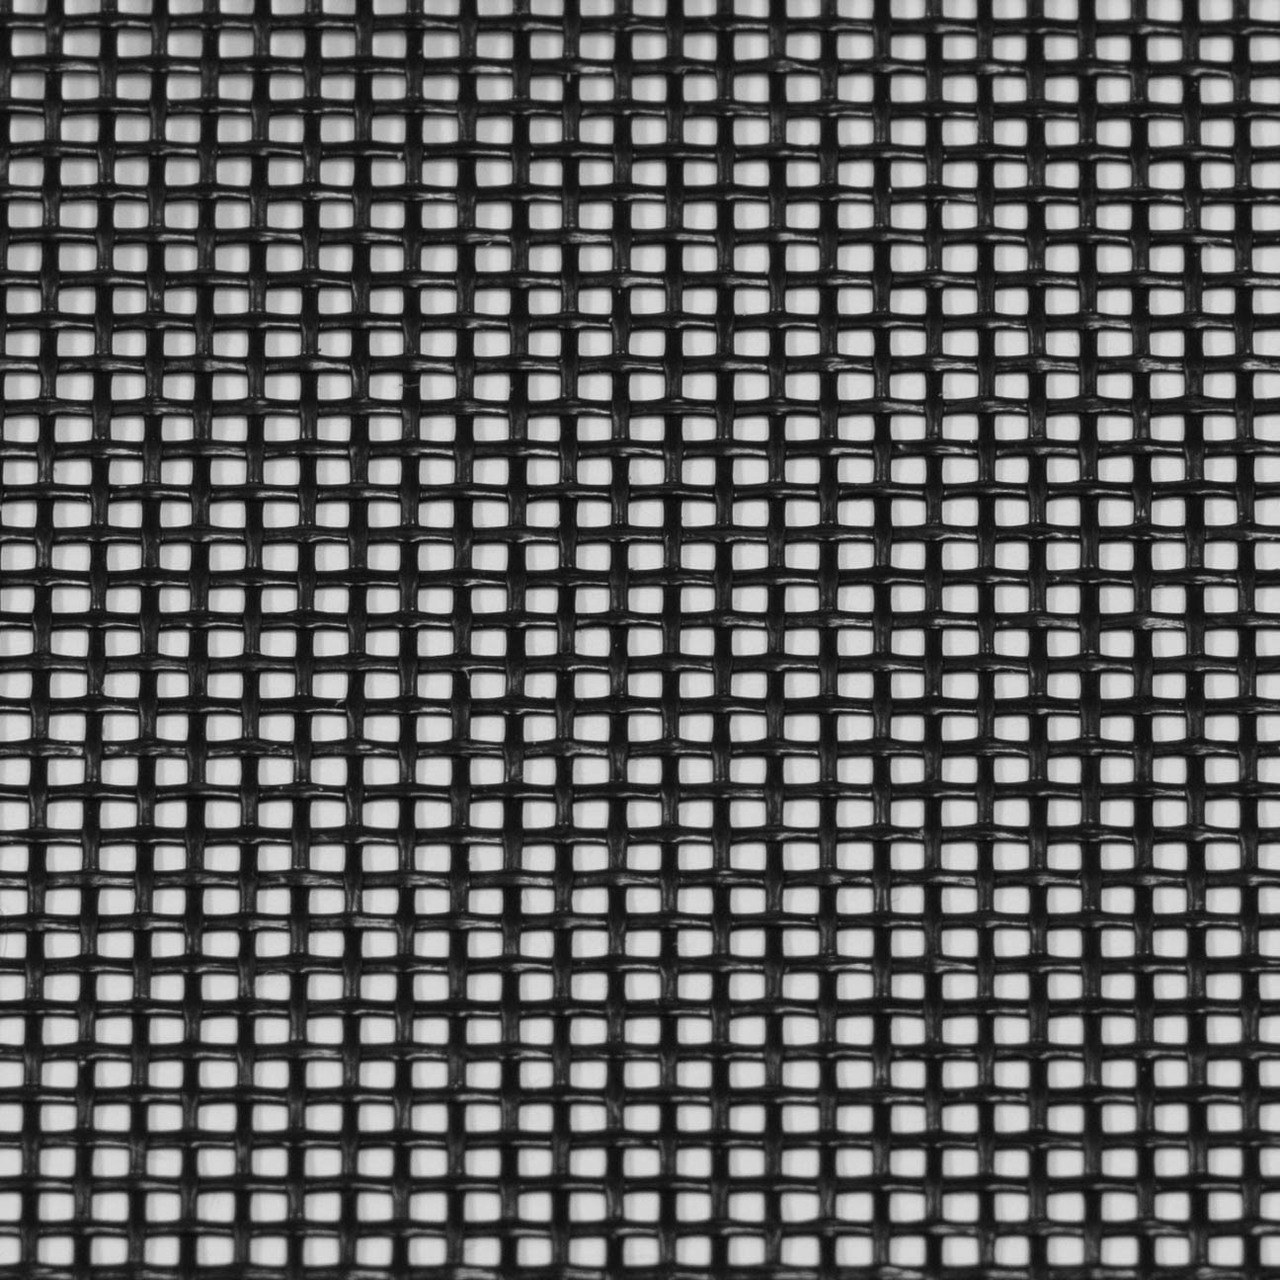 120 Inch x 50 Ft Super Screen Tiny Mesh 20 x 17